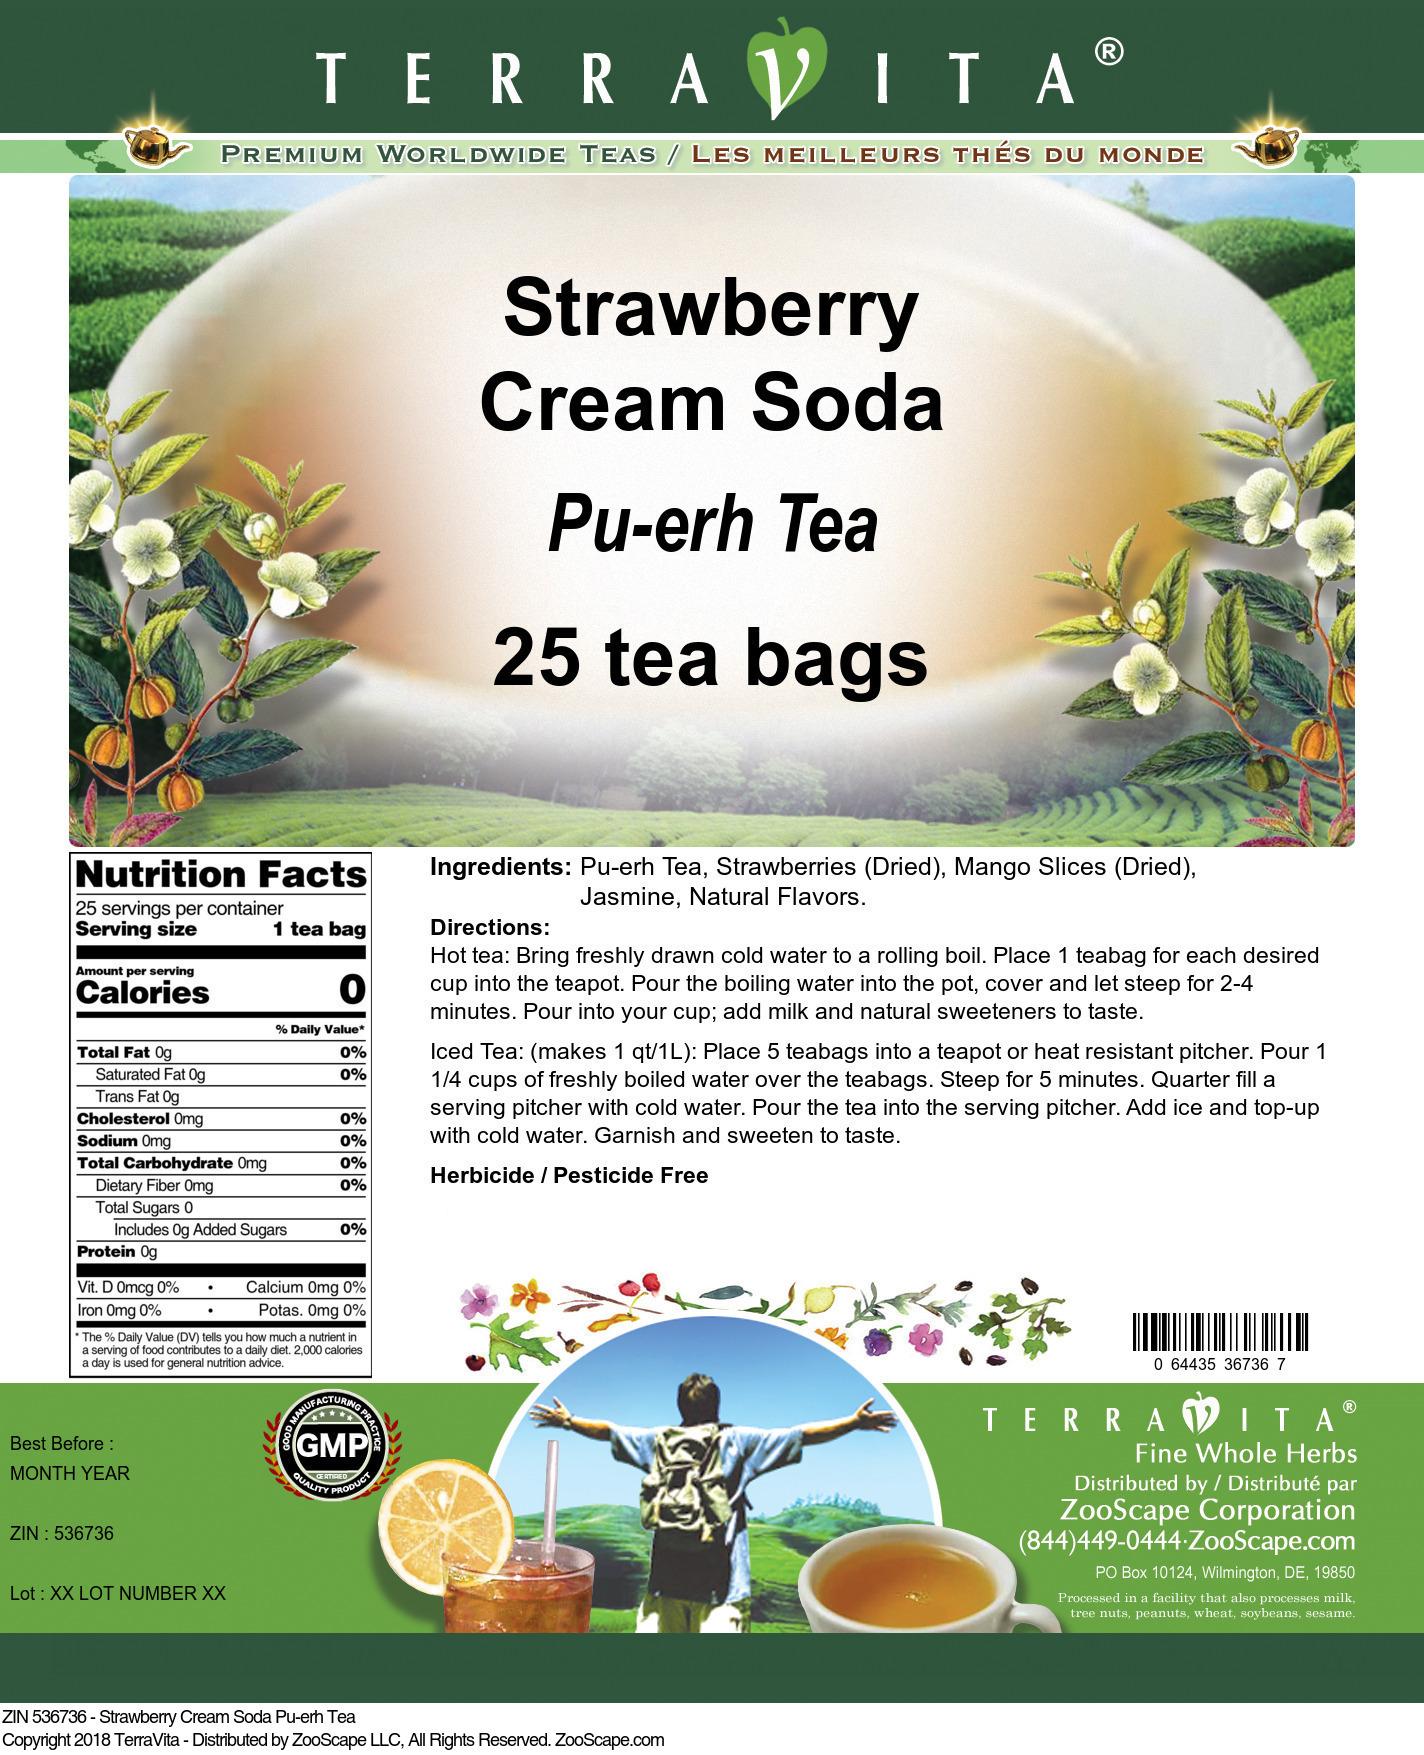 Strawberry Cream Soda Pu-erh Tea